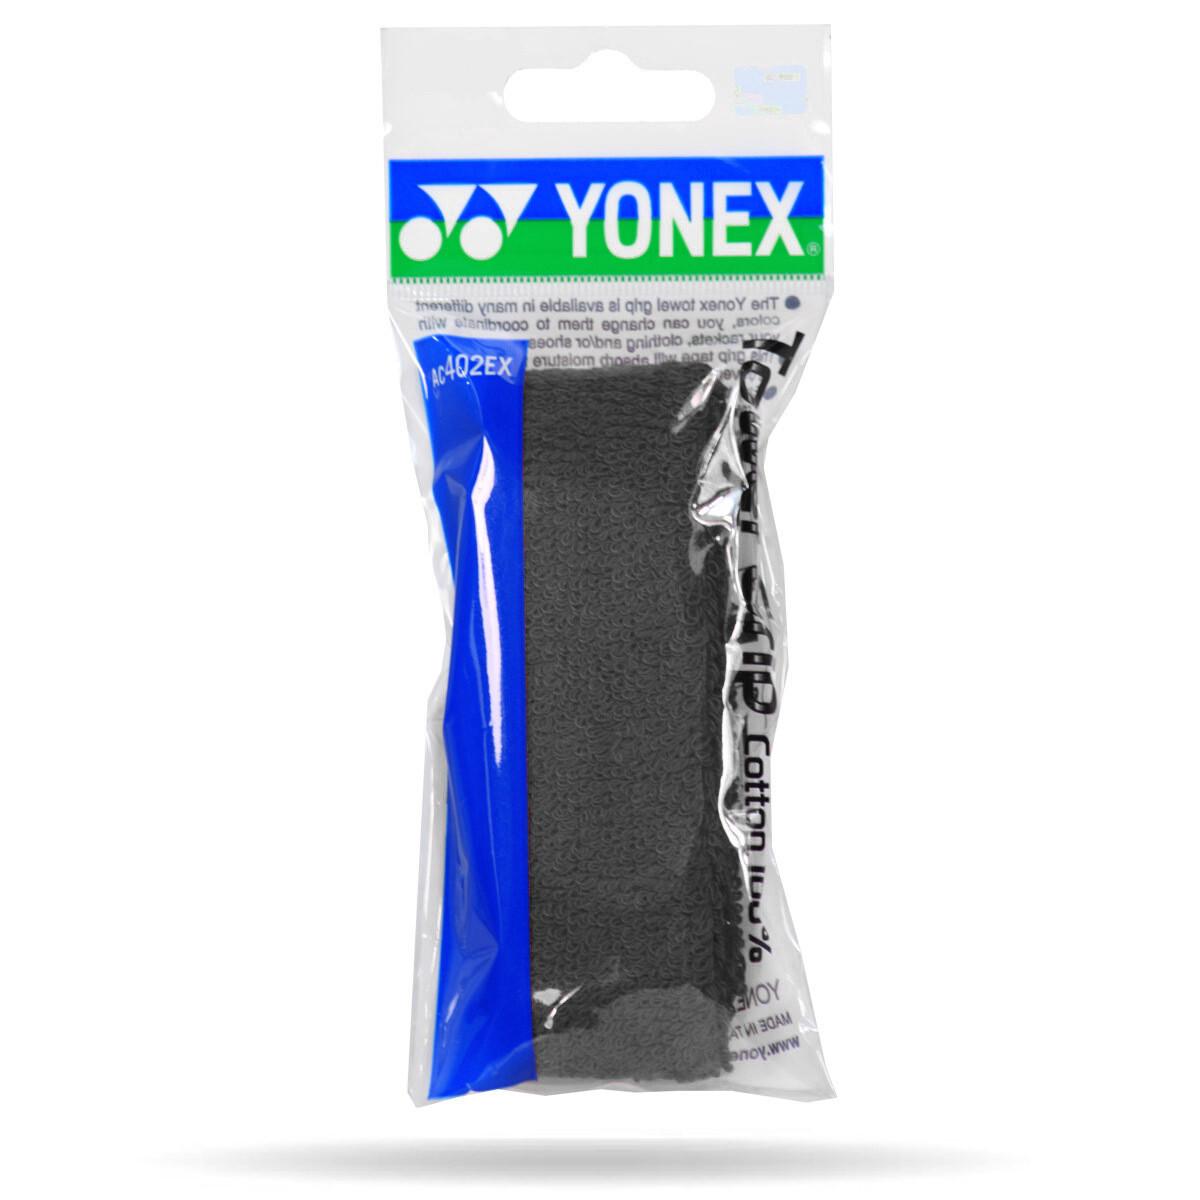 Yonex Towel Grip - Black